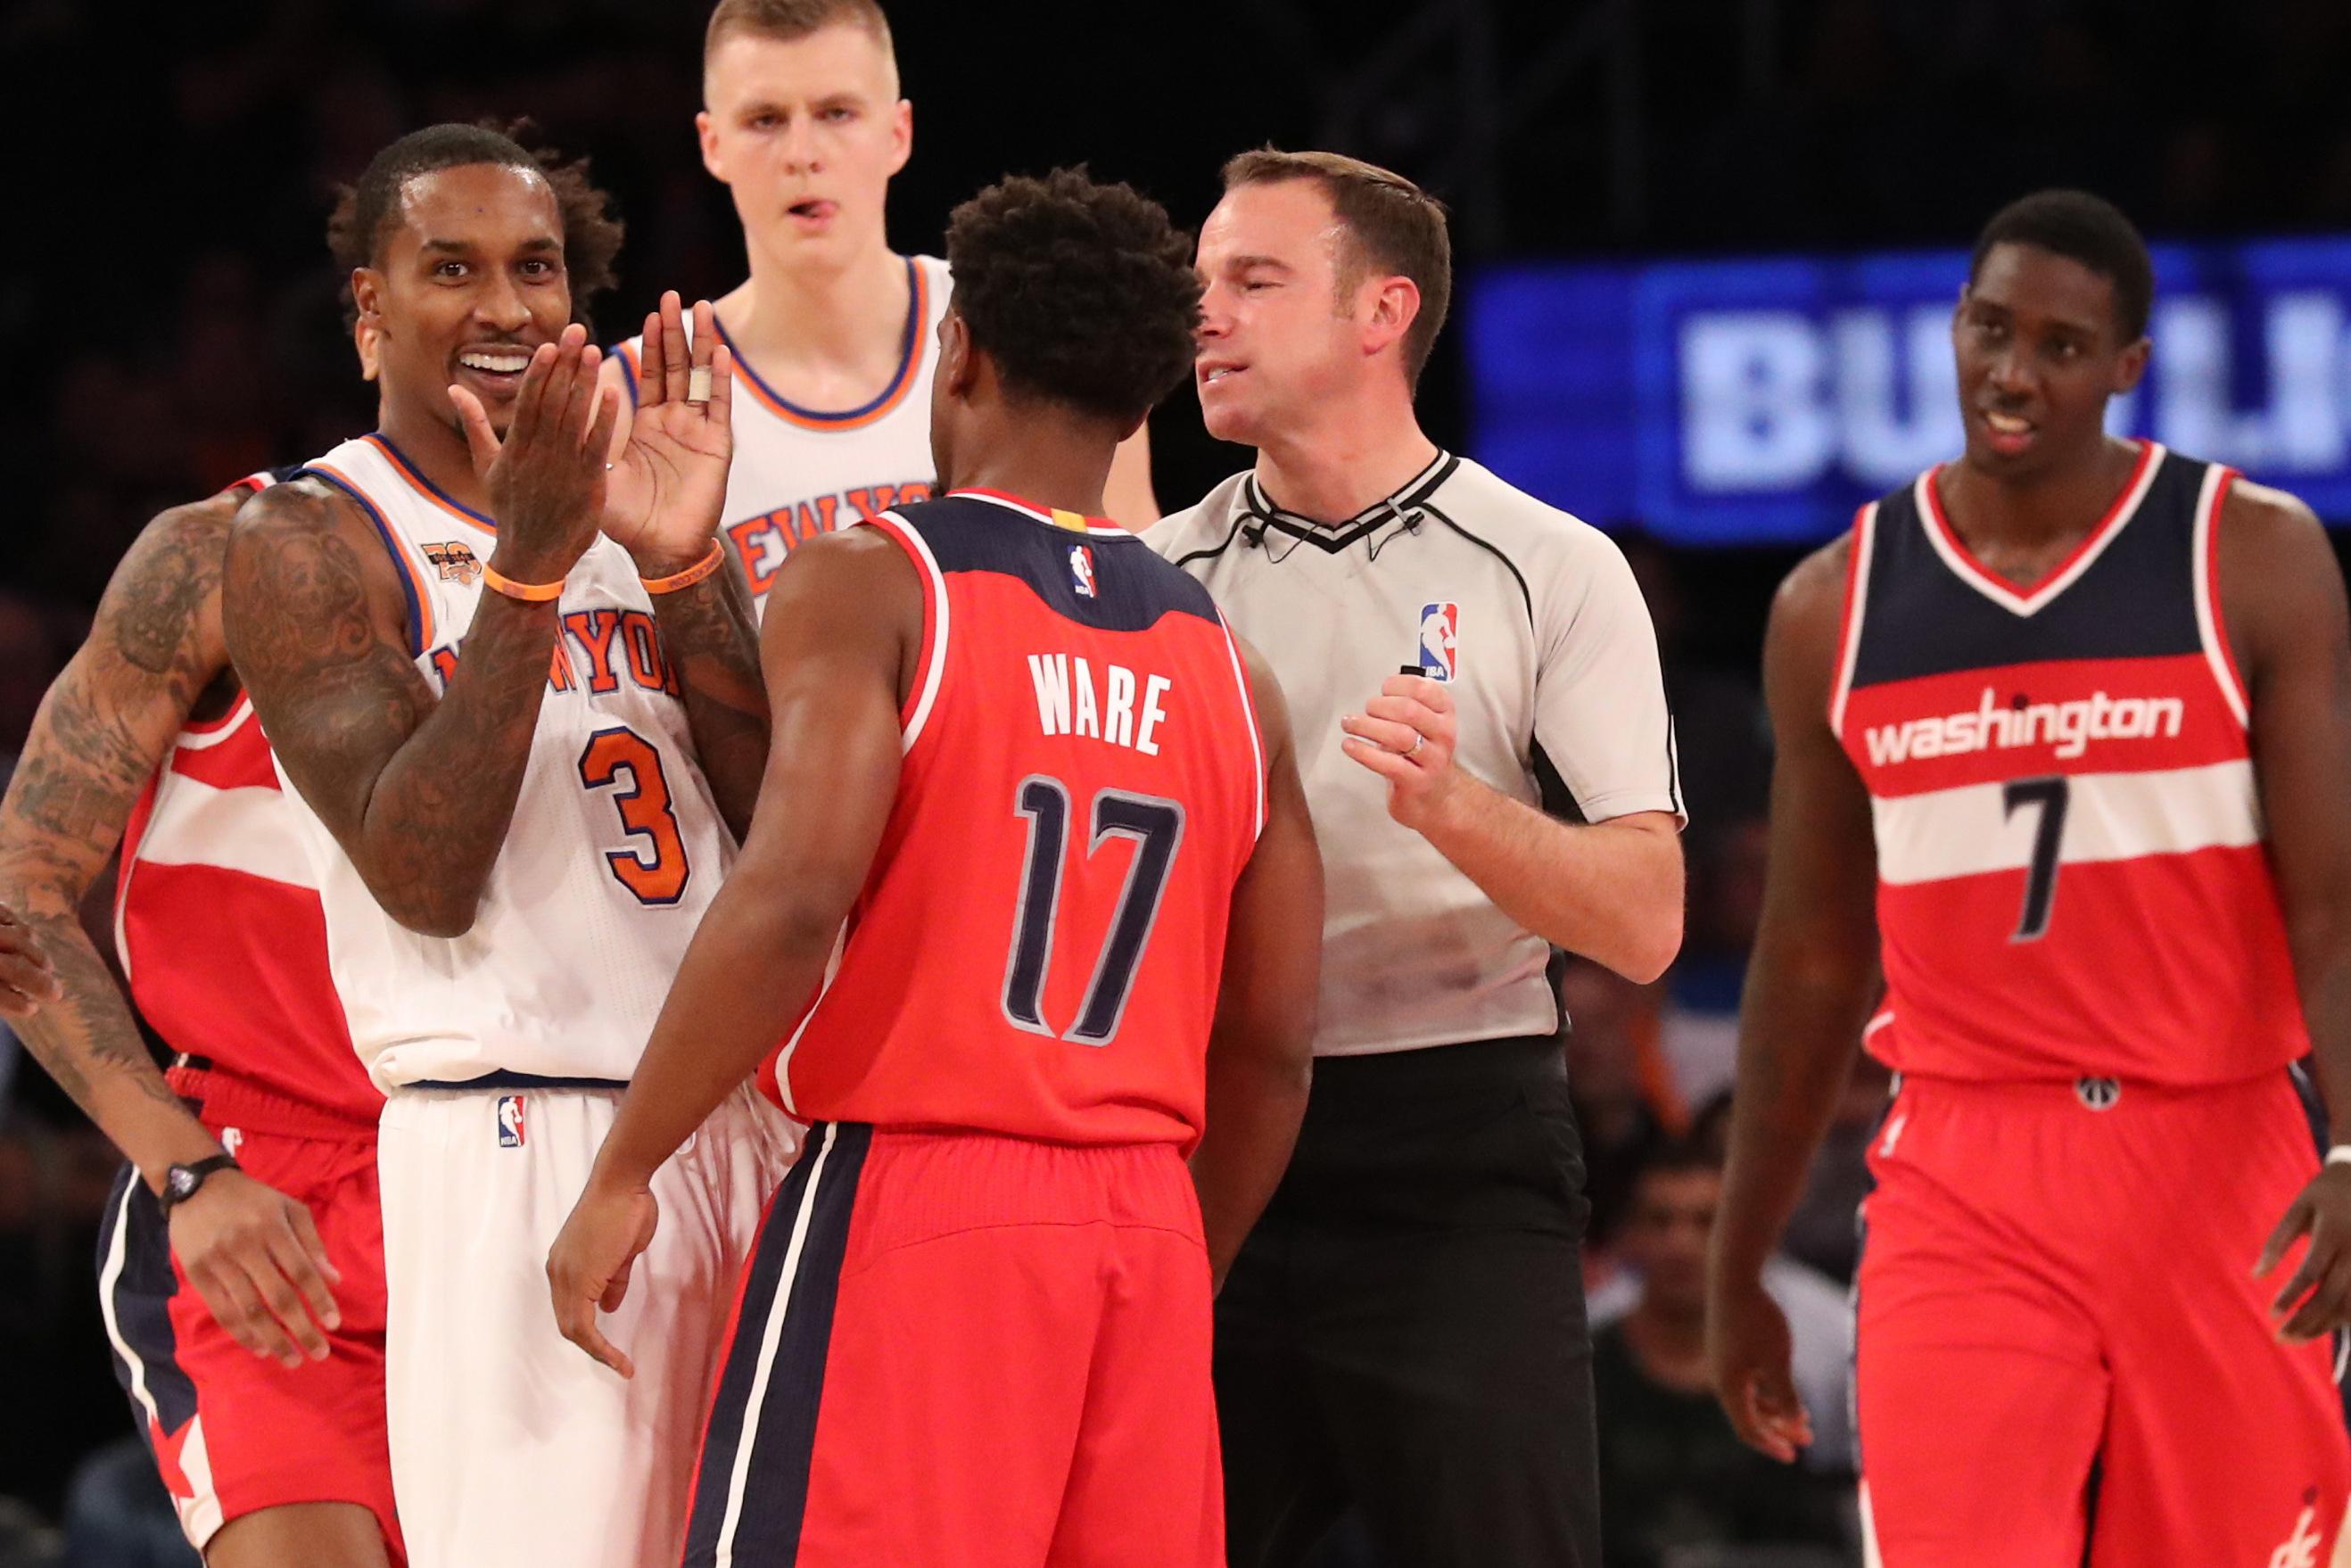 Oct 10, 2016; New York, NY, USA; New York Knicks guard Brandon Jennings (3) and Washington Wizards guard <a rel=